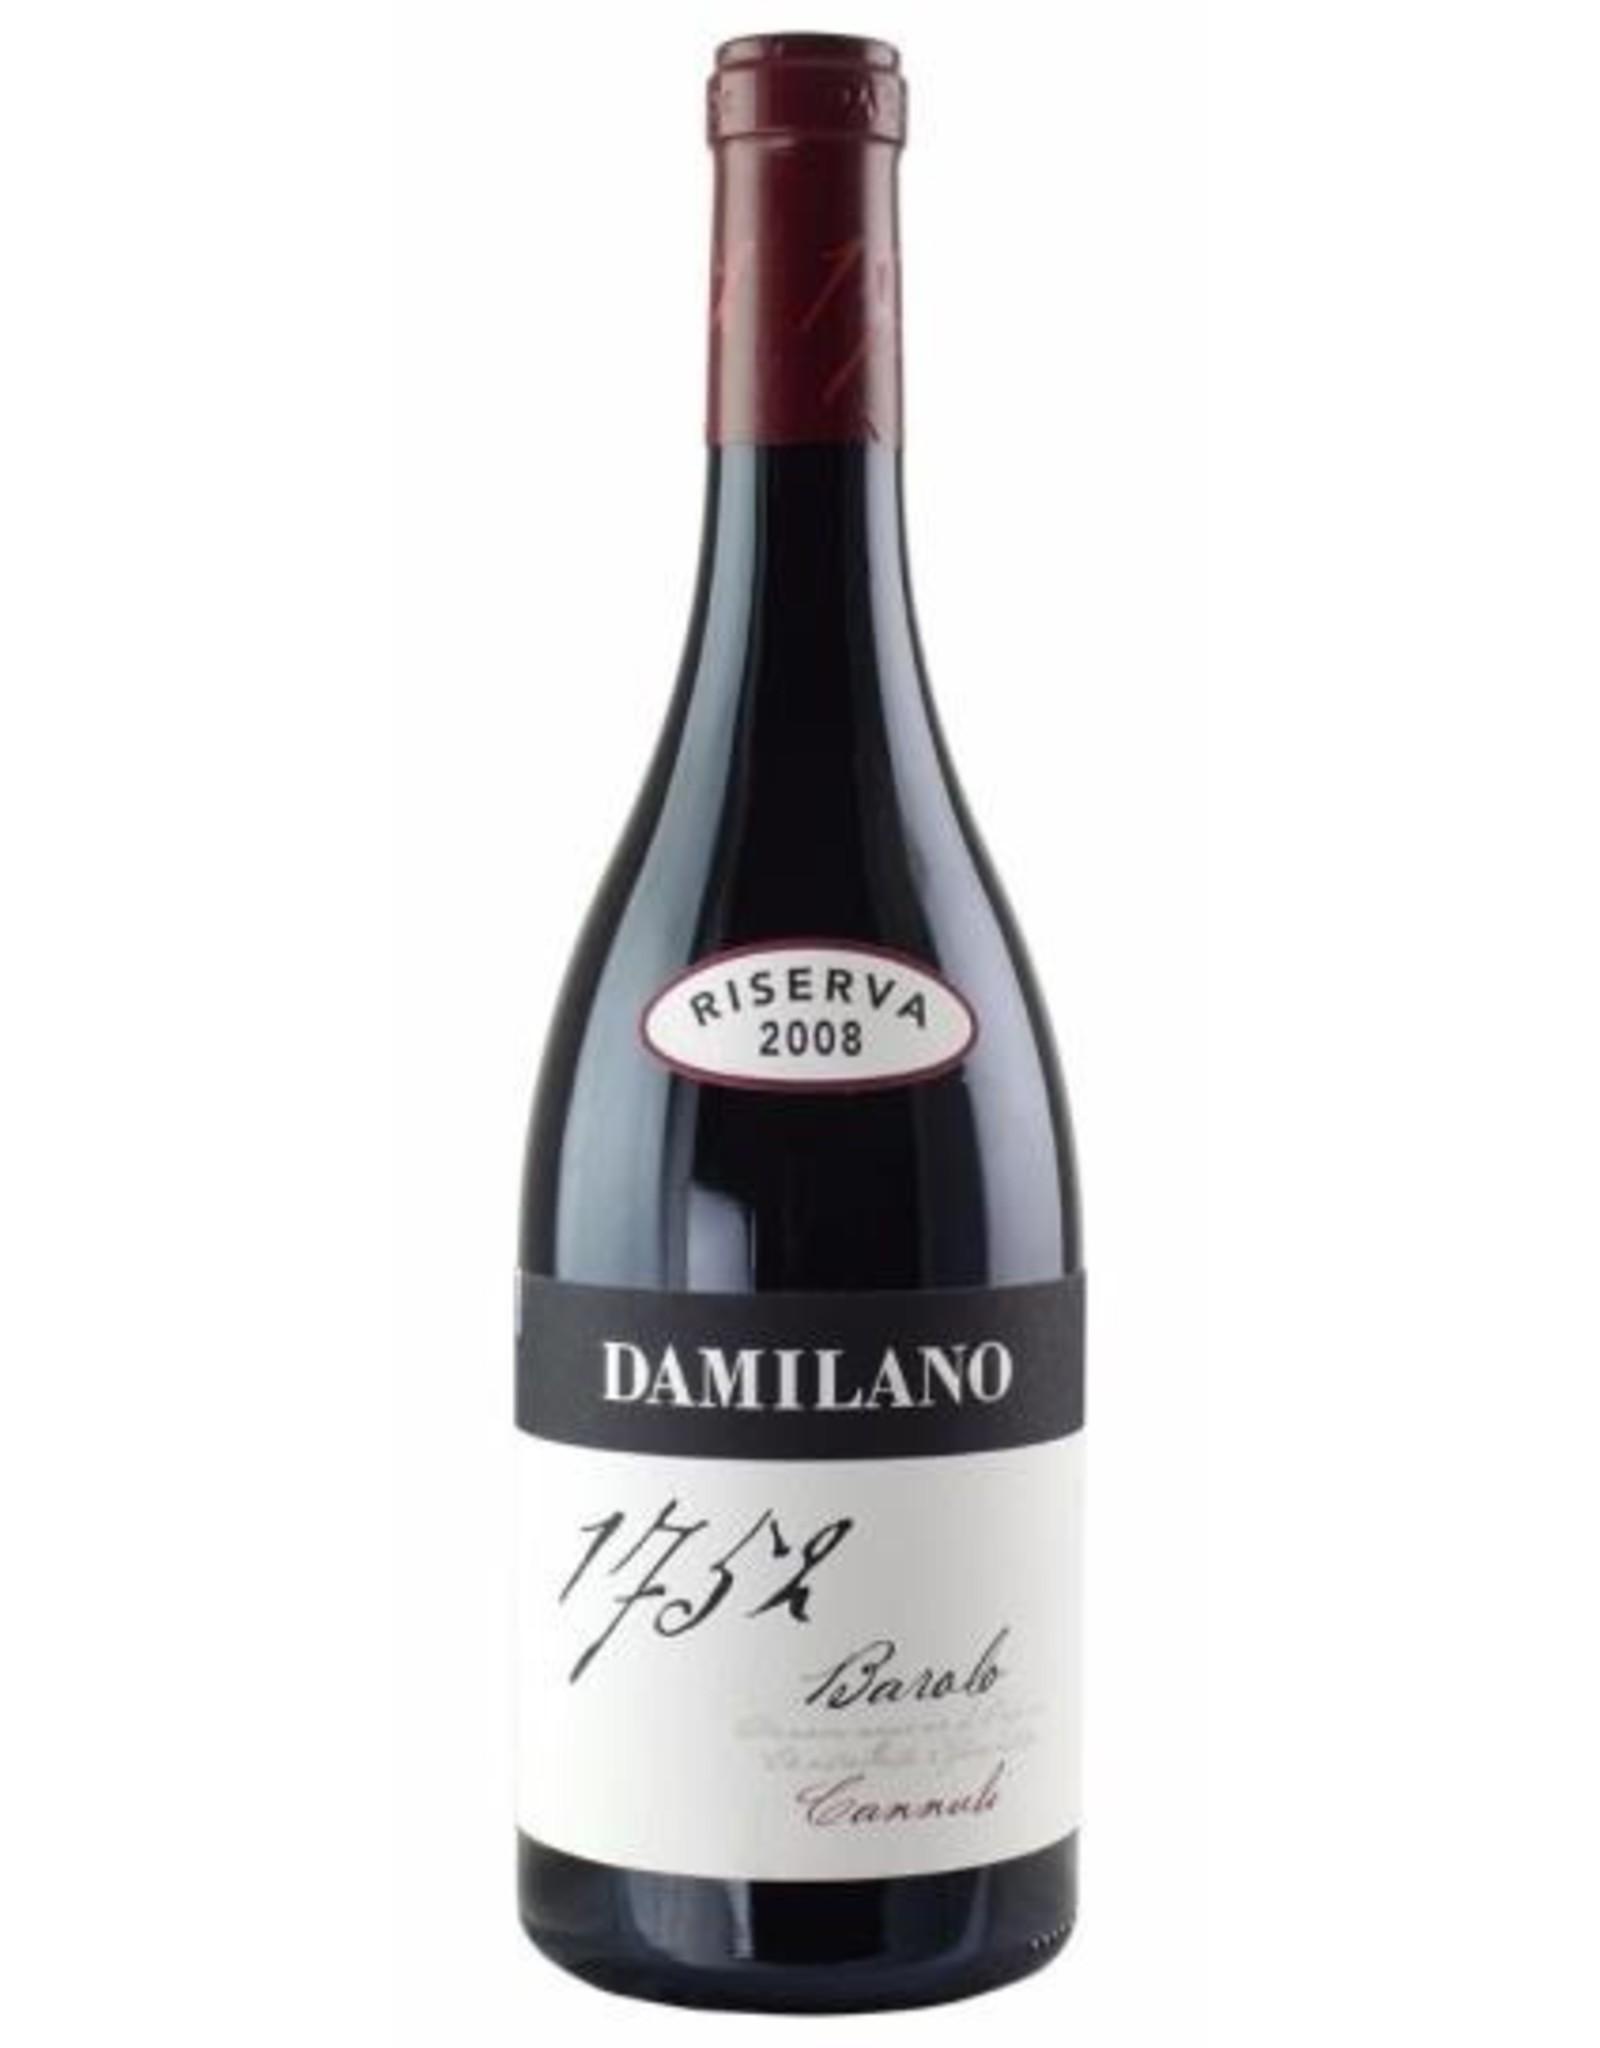 Red Wine 2008, Damilano Reserve Cannubi Vineyard, Nebbiolo, Barolo, Piemonte, Italy, 14% Alc, CT